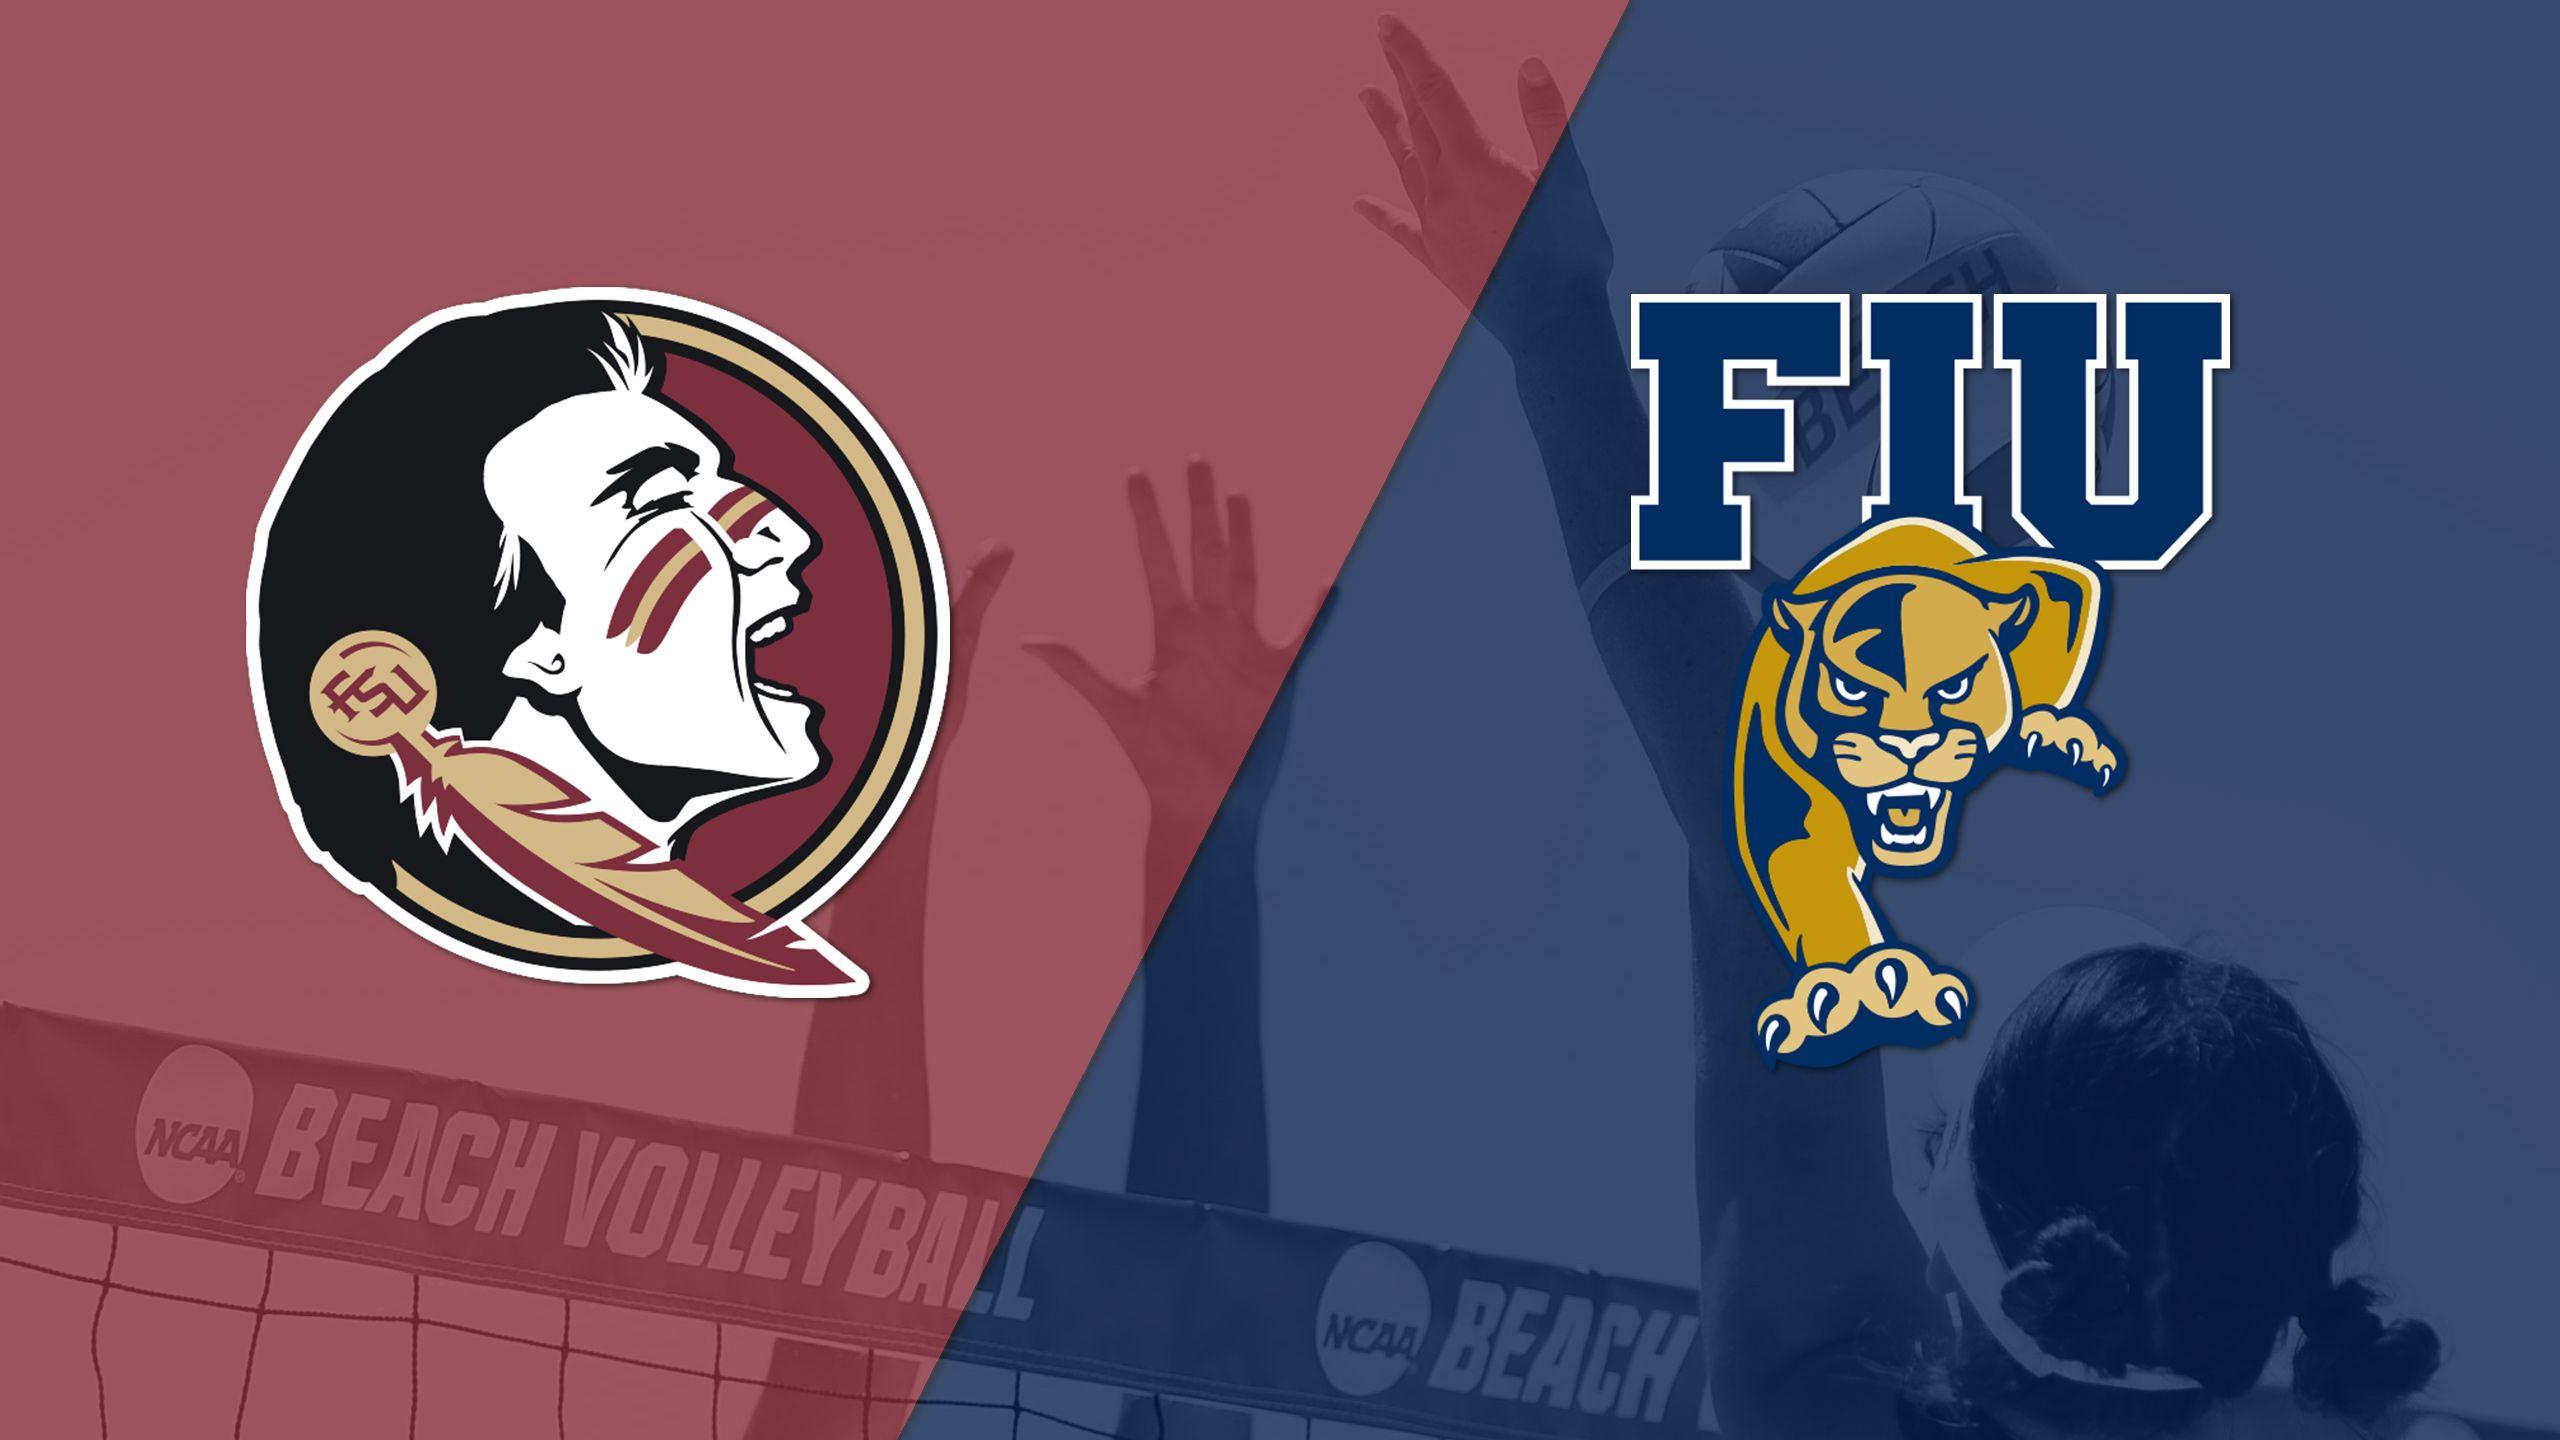 Florida State vs. Florida International (Final) (CCSA Beach Volleyball Championship)